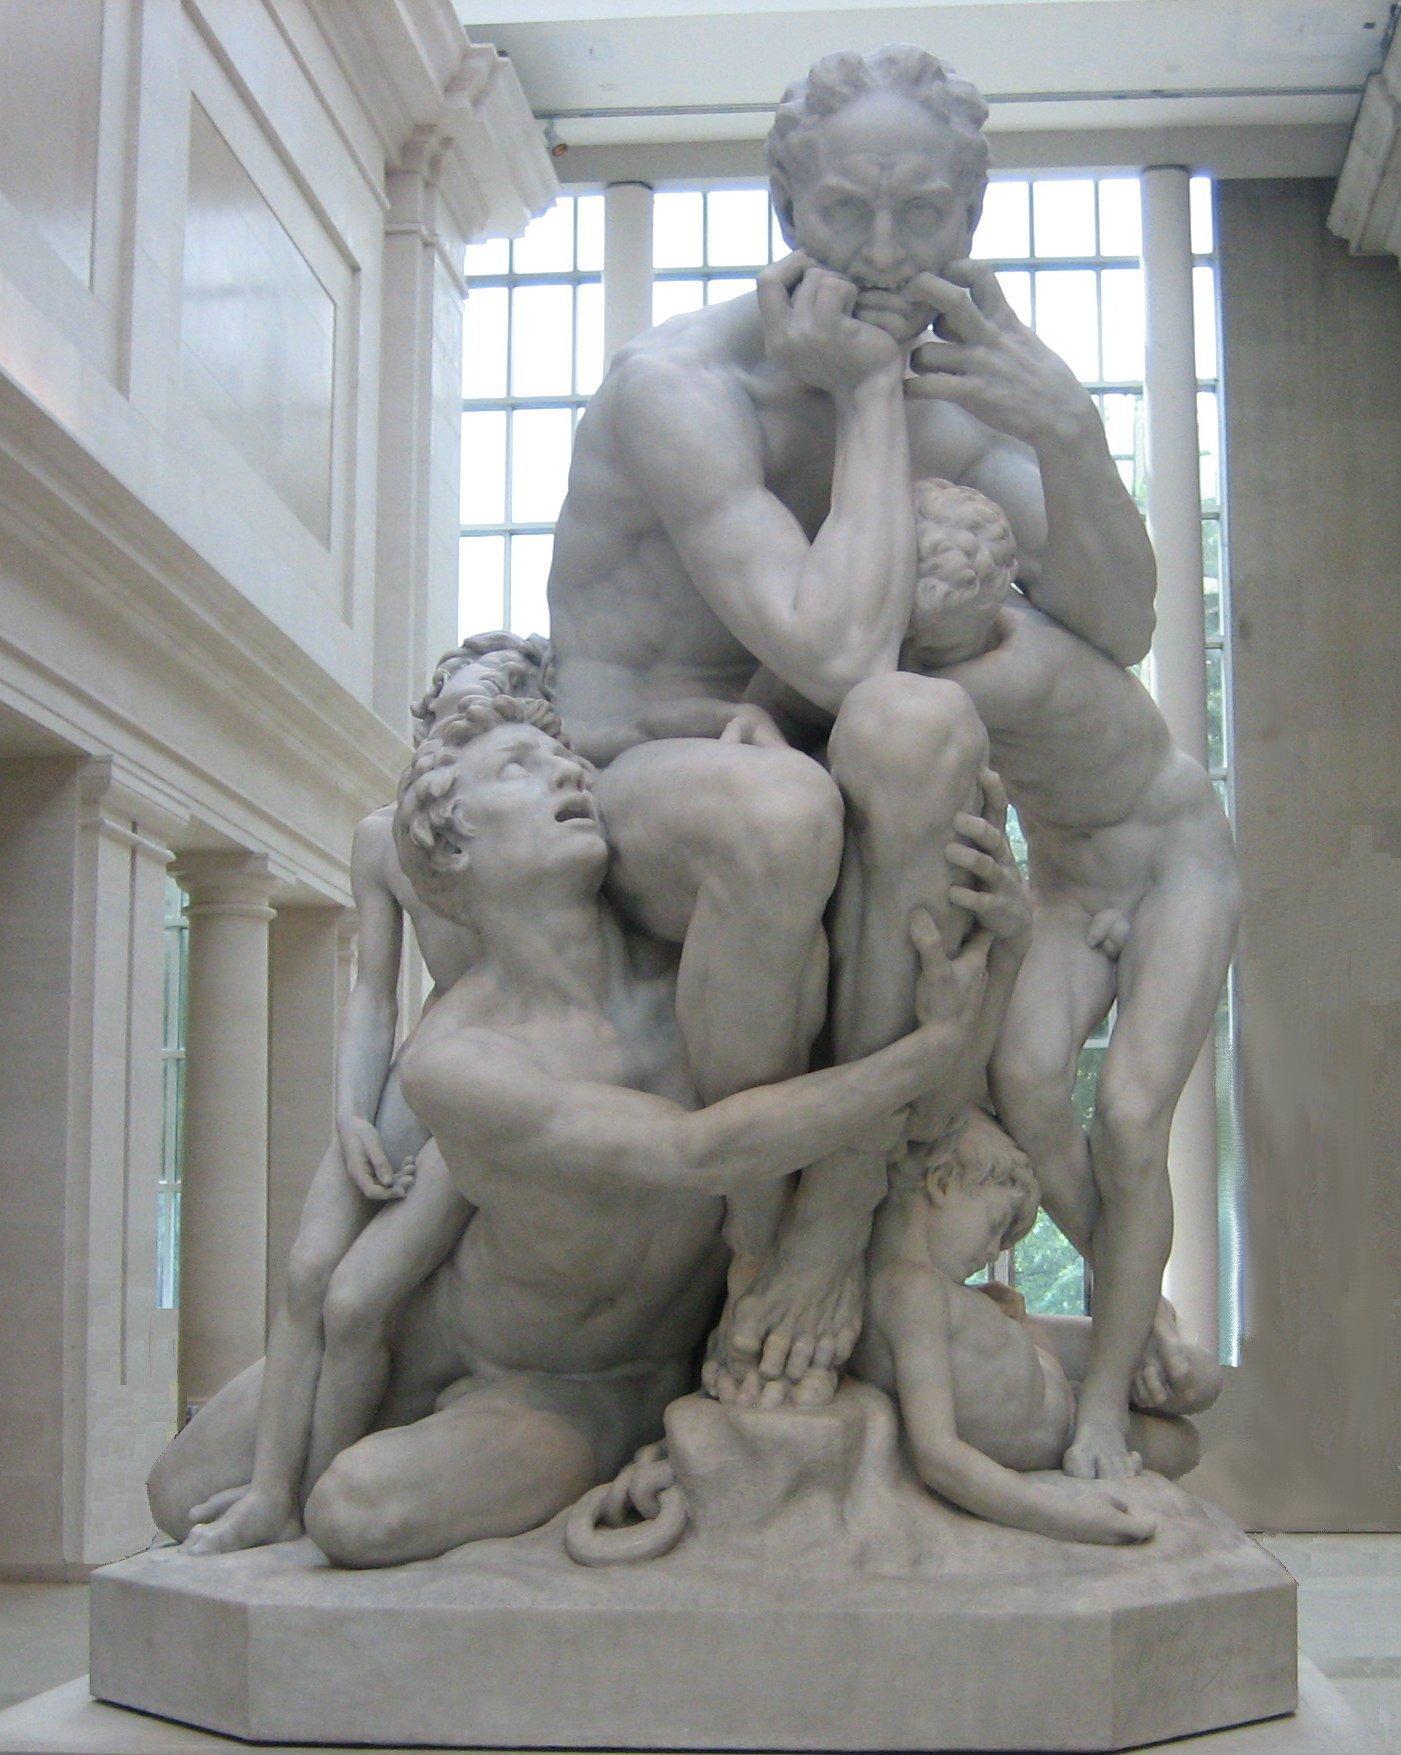 jean-baptiste_carpeauxs_marble_sculpture_ugolino_and_his_sons_metropolitan_museum_of_art1